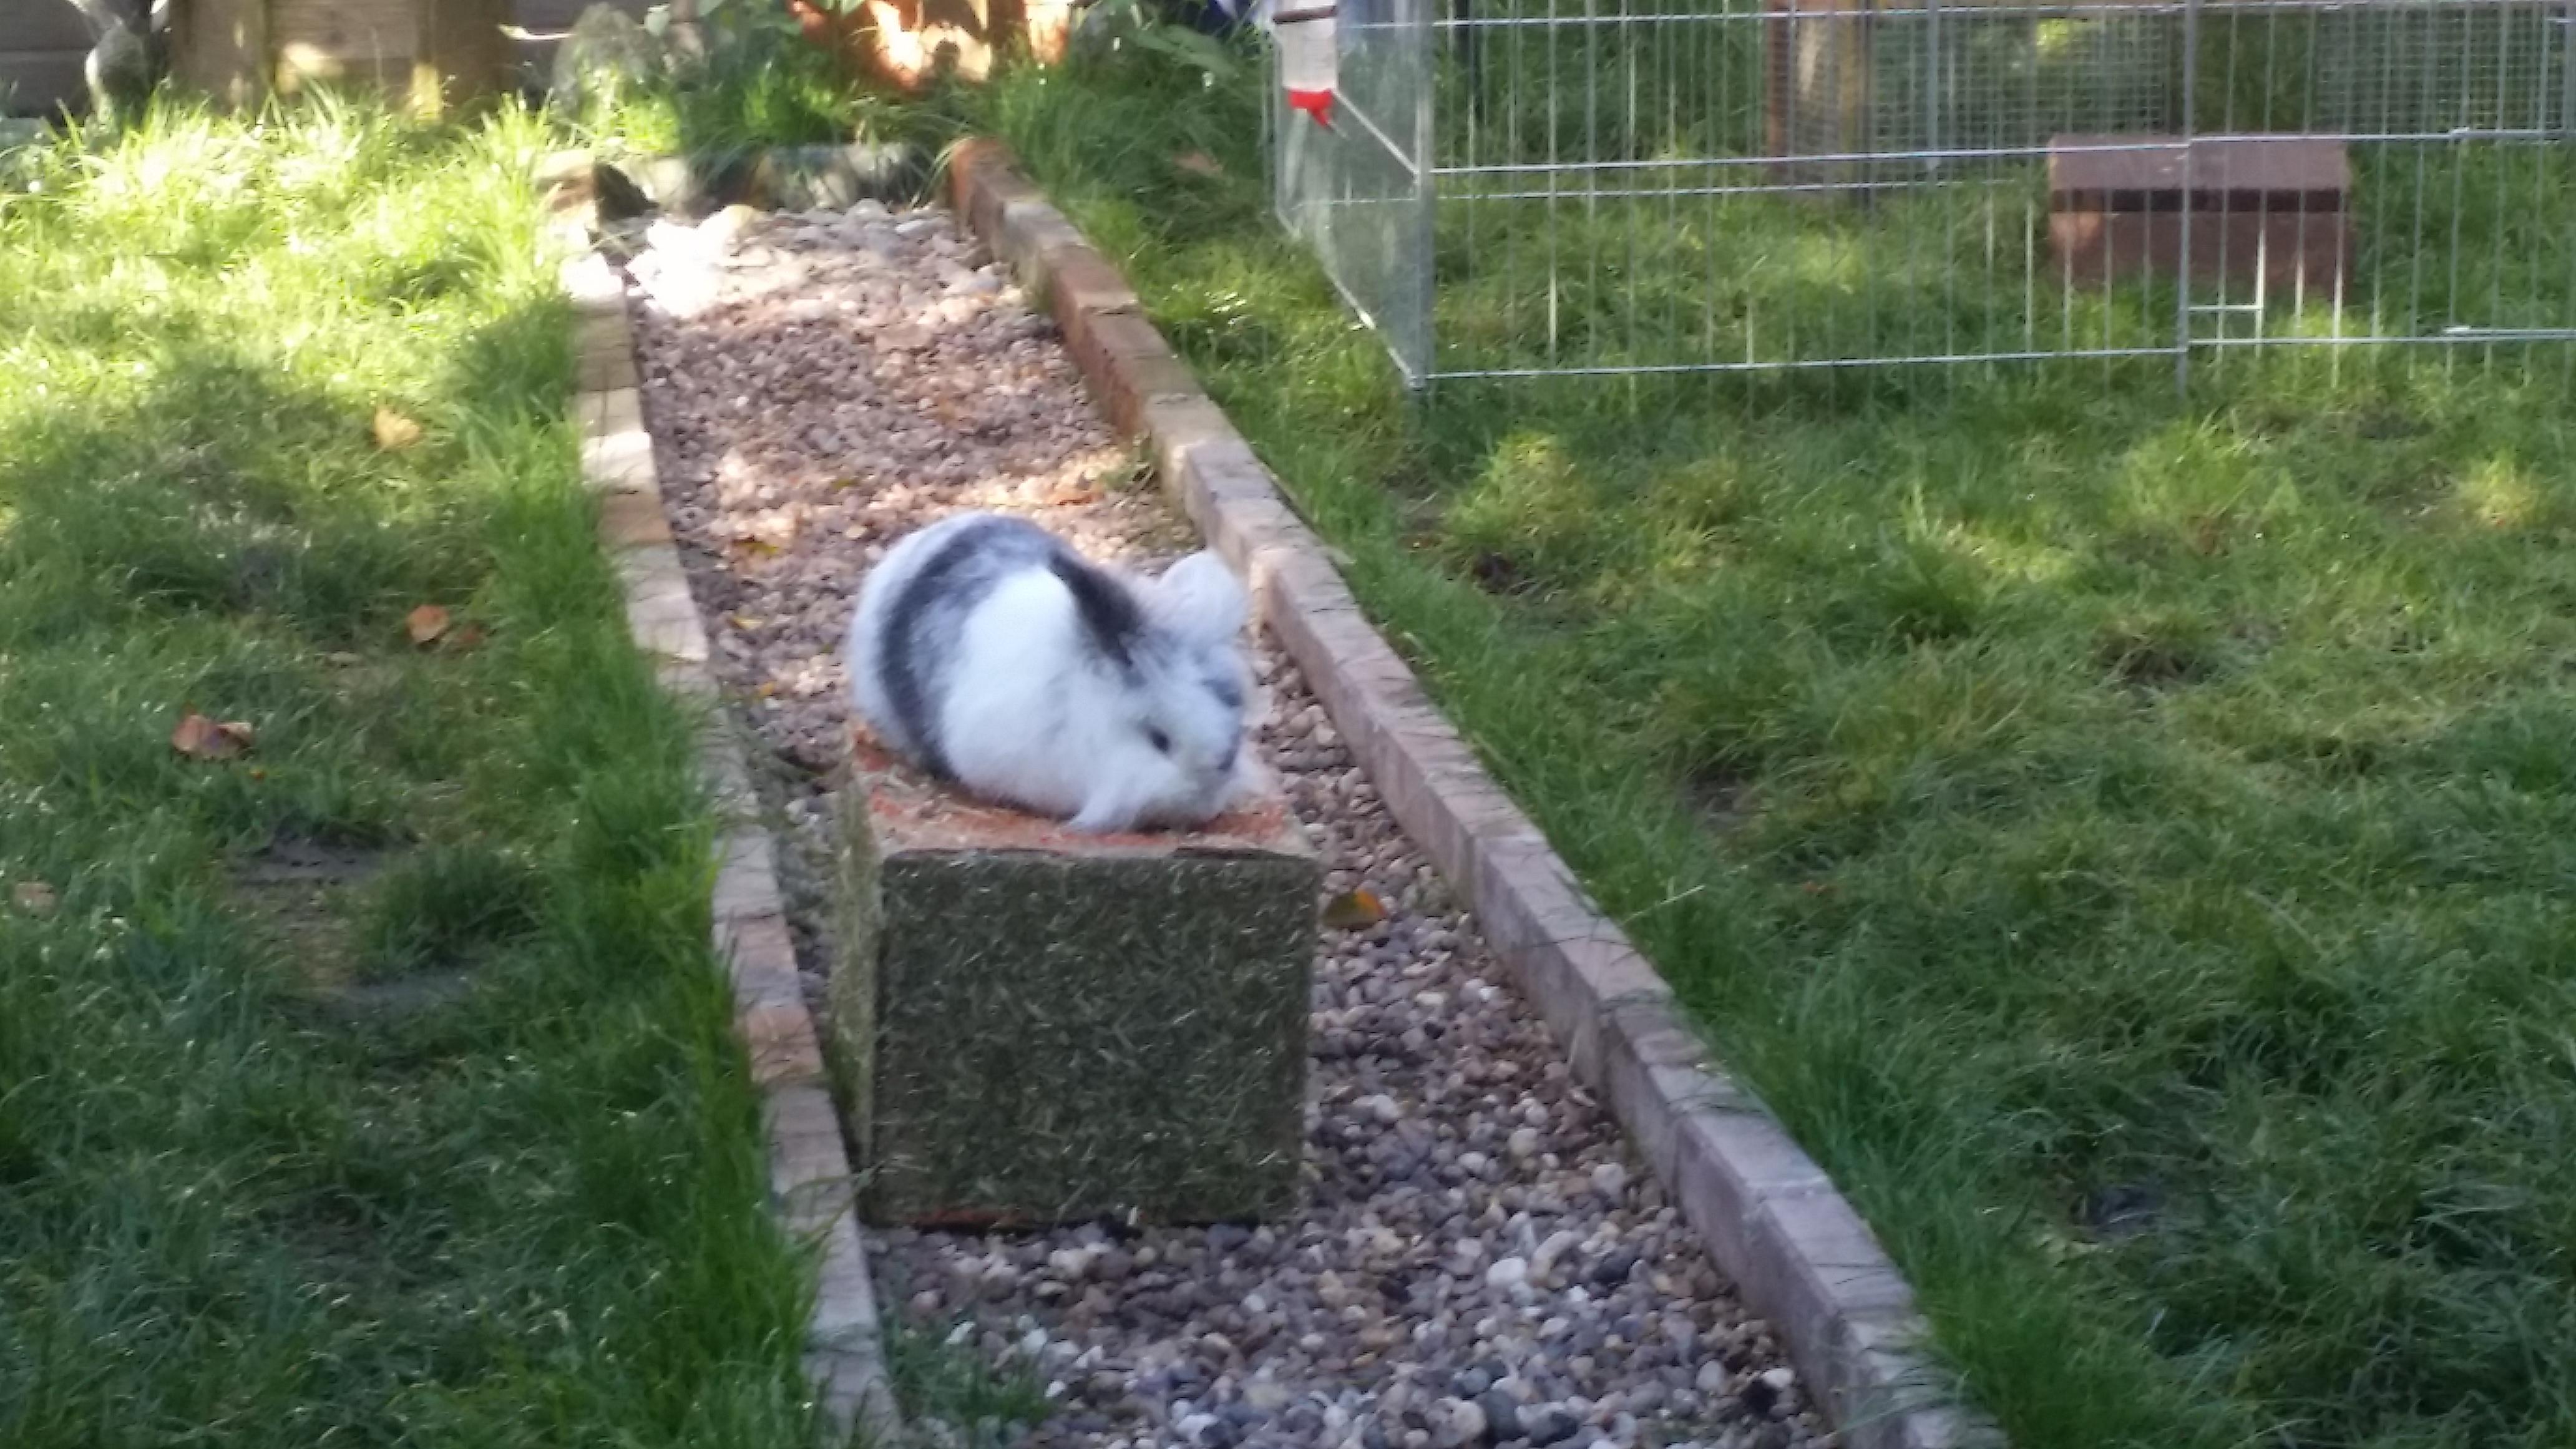 Garden Centre: Pet And Garden Centre Haywards Heath